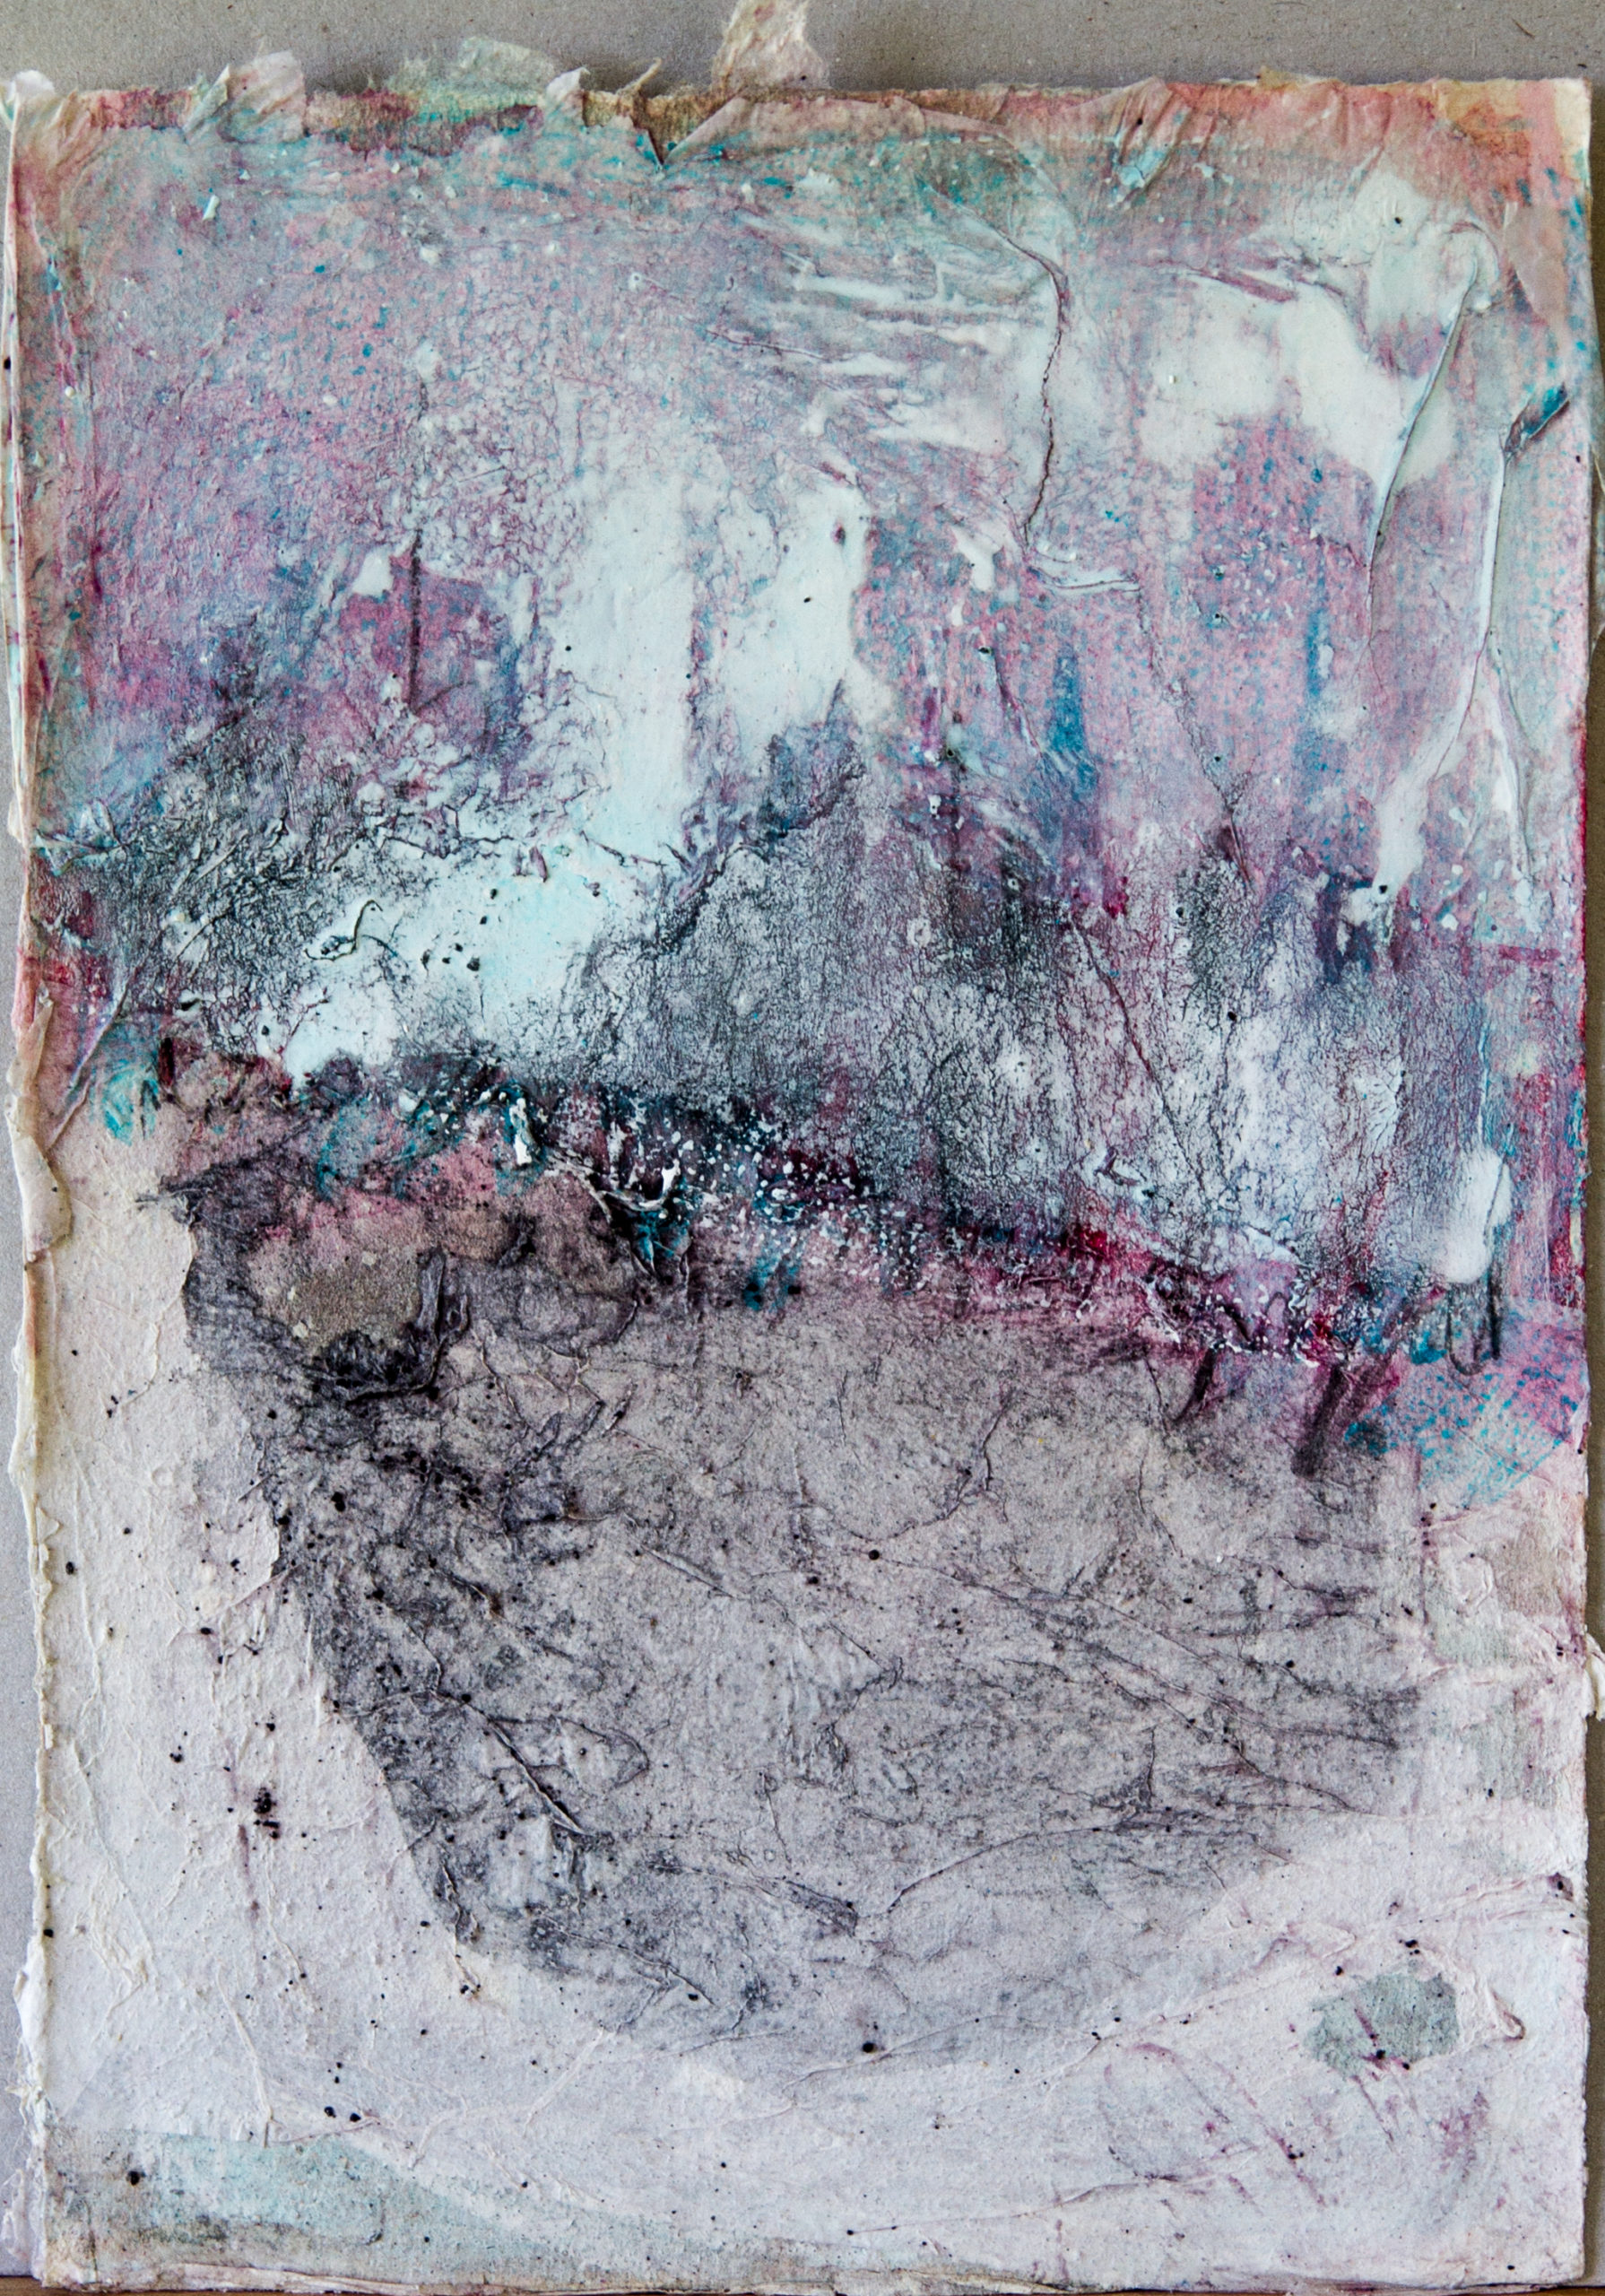 Keim: 24x30,Acryl, Gesteinsmehle, Pigmente, Bleistift, Kreide, Papier auf Papier,2014